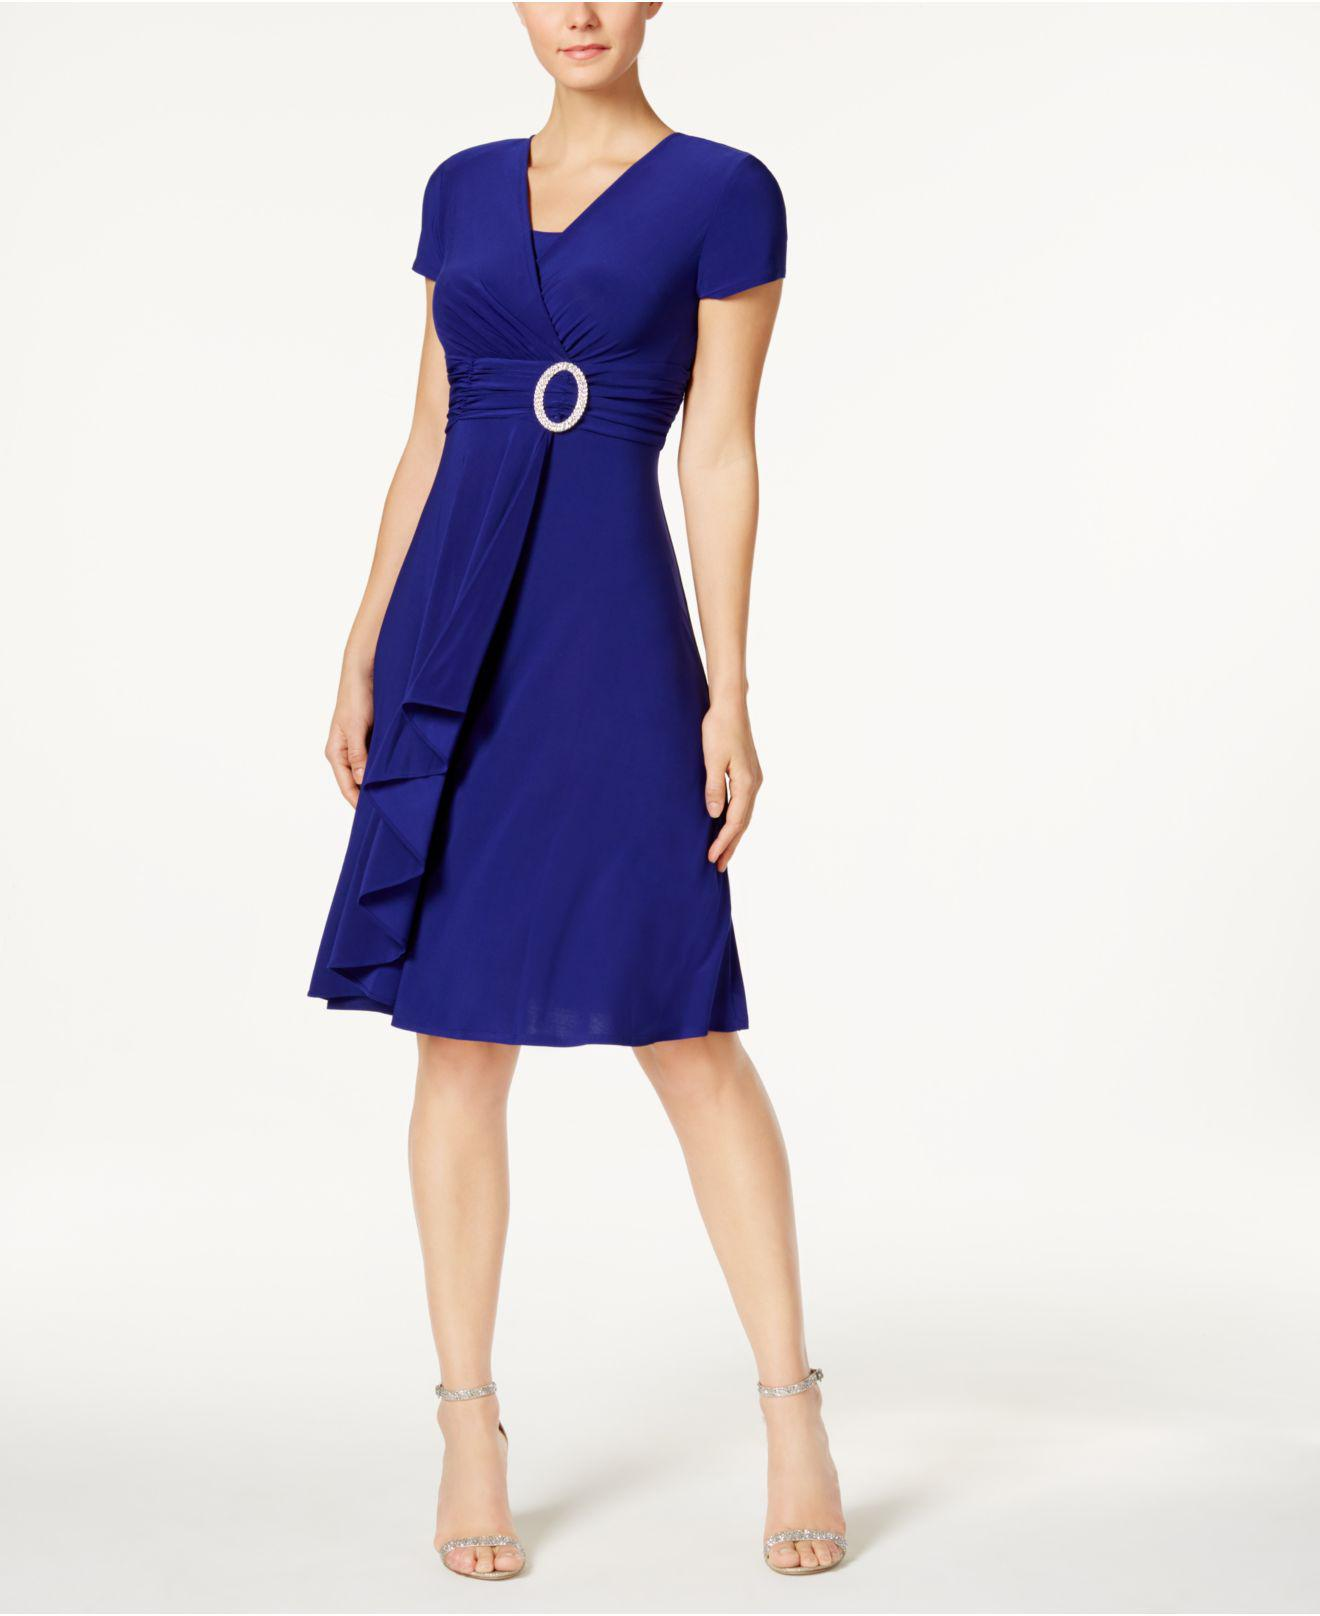 e9fe54c2a3d88 Lyst - R   M Richards Dress